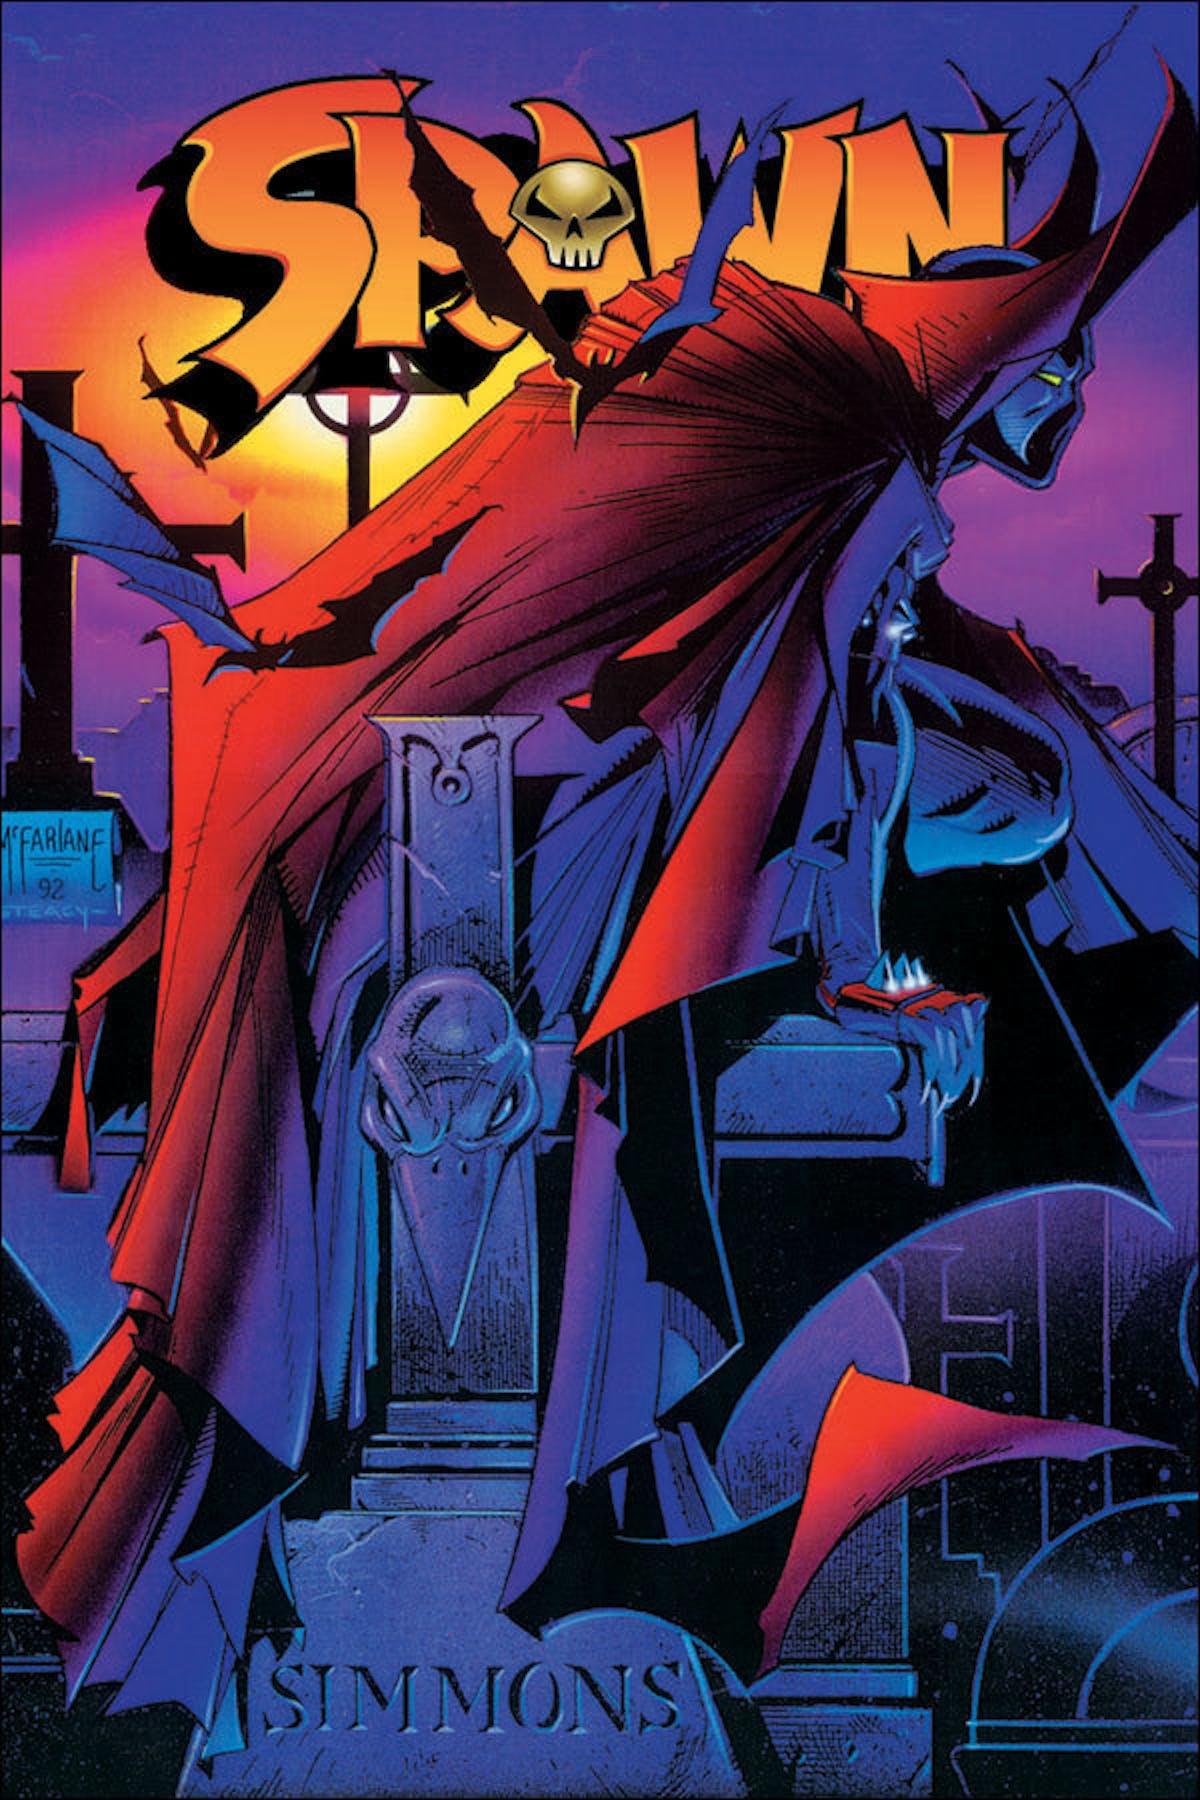 'Spawn' Issue 2, Image Comics